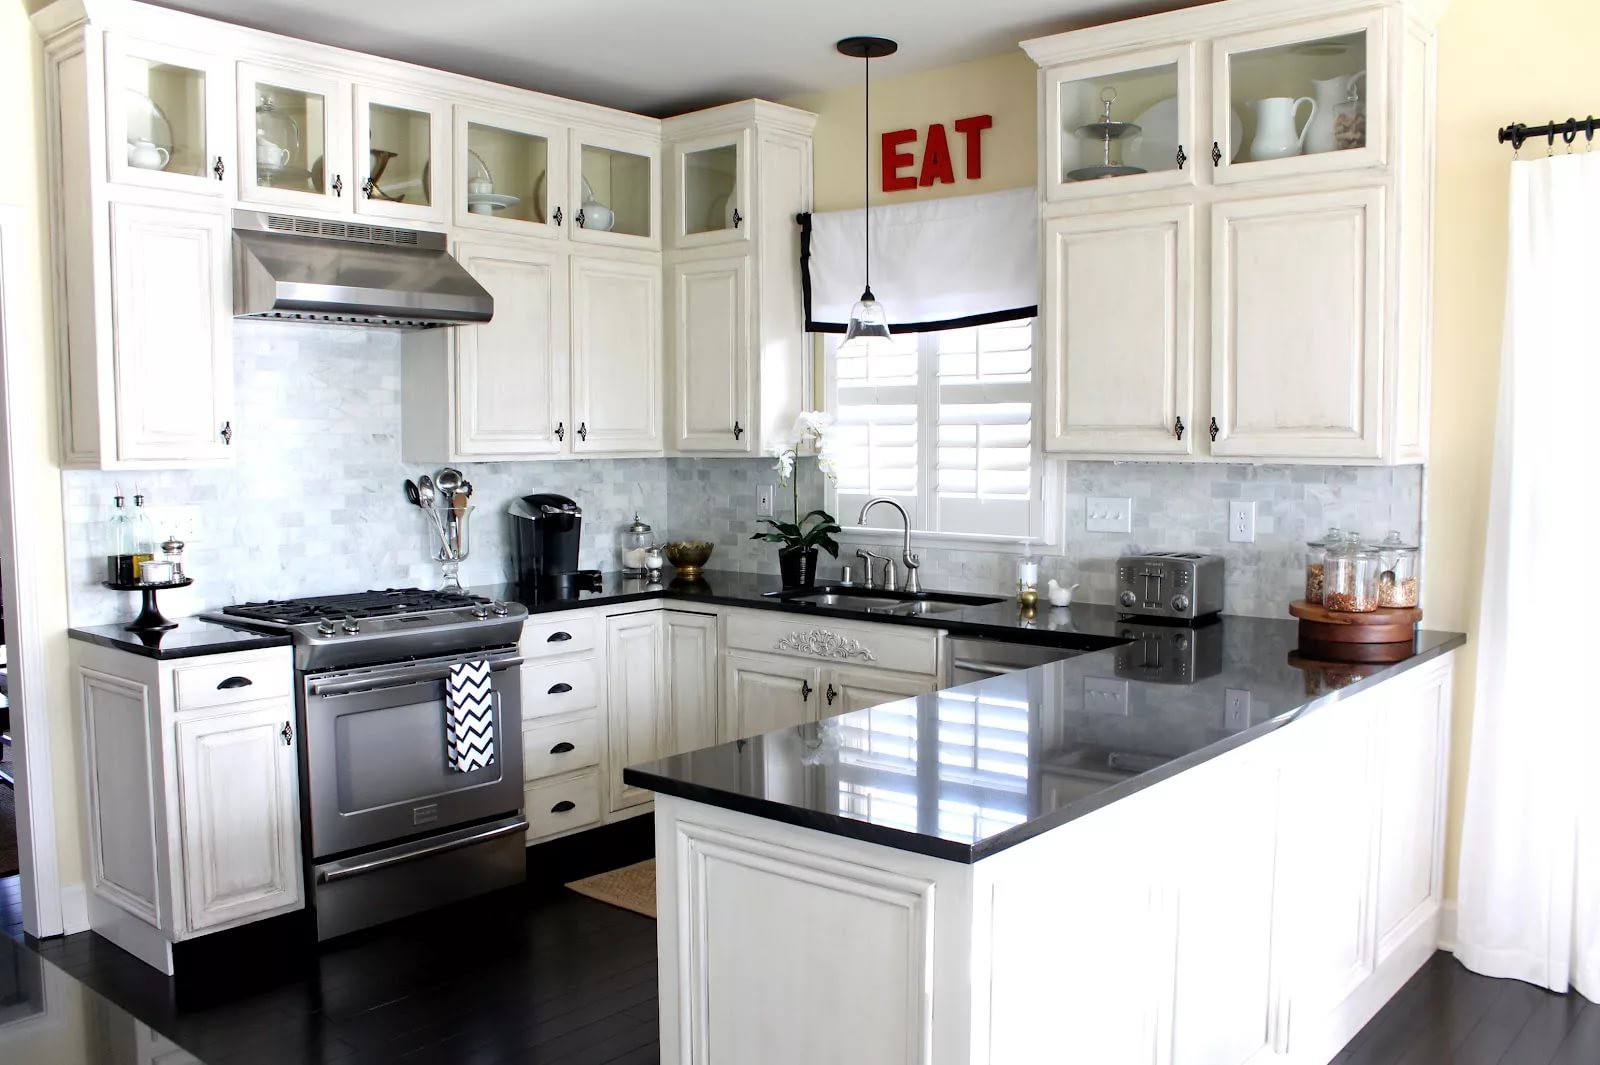 Вариант размещения мебели на кухне 12 кв.м.